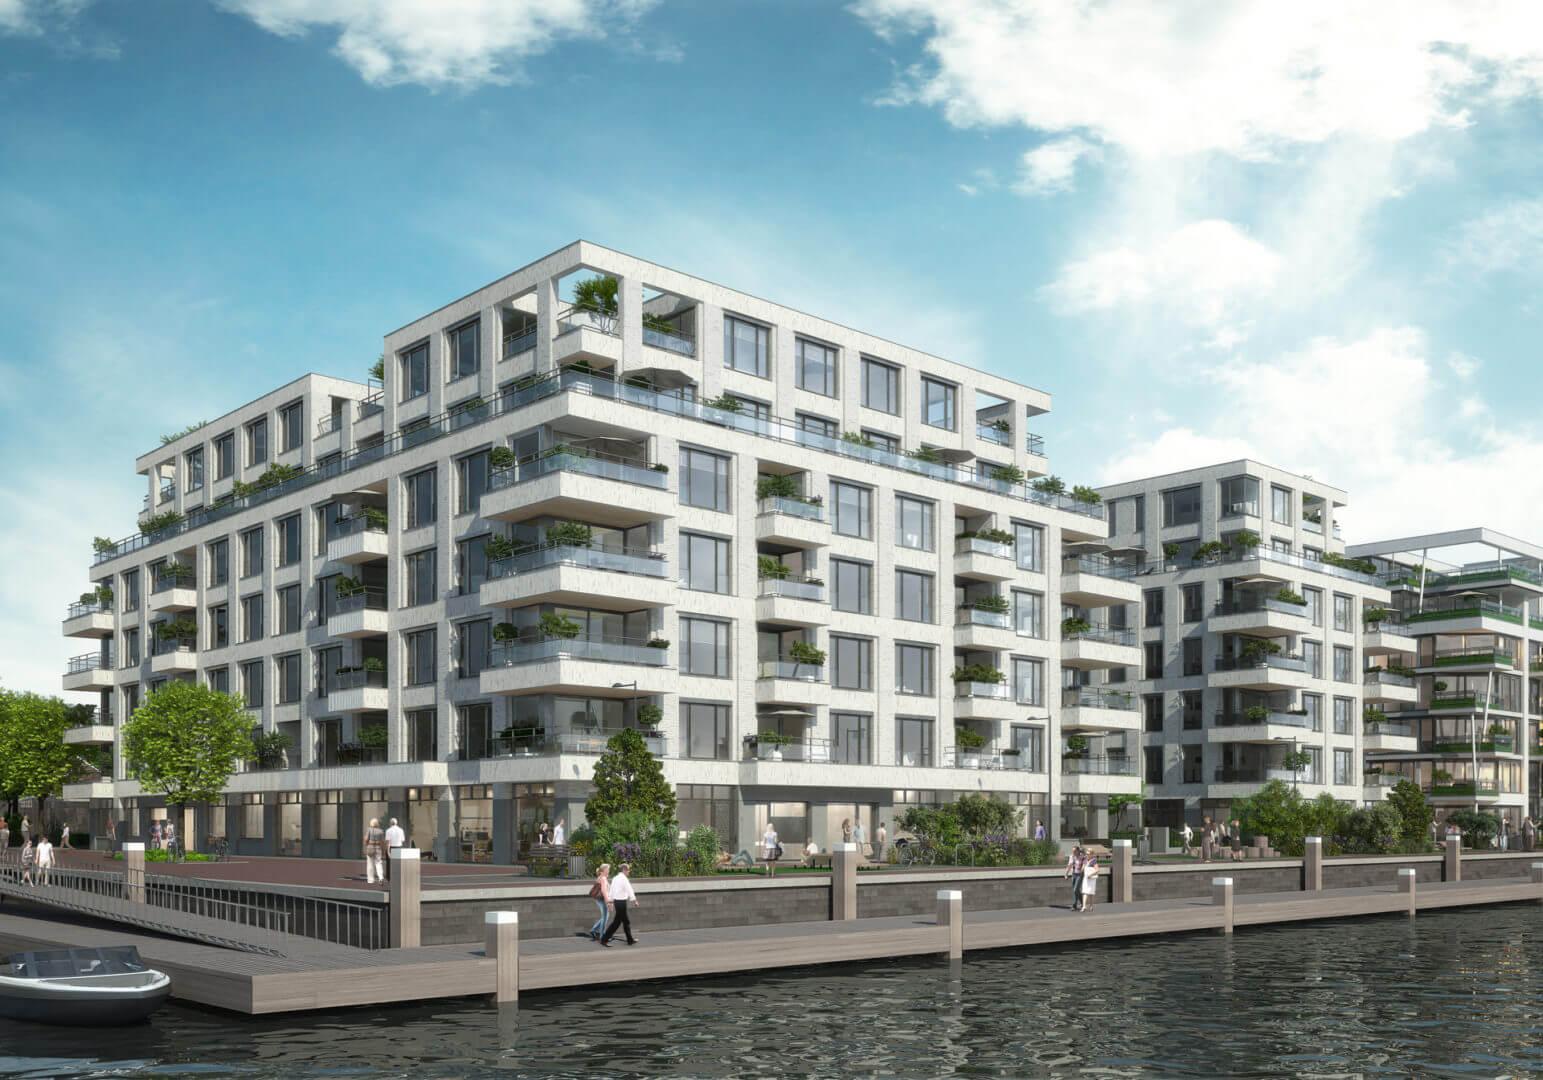 Cruquius-Werk-yoreM-nieuwbouwproject-Amsterdam